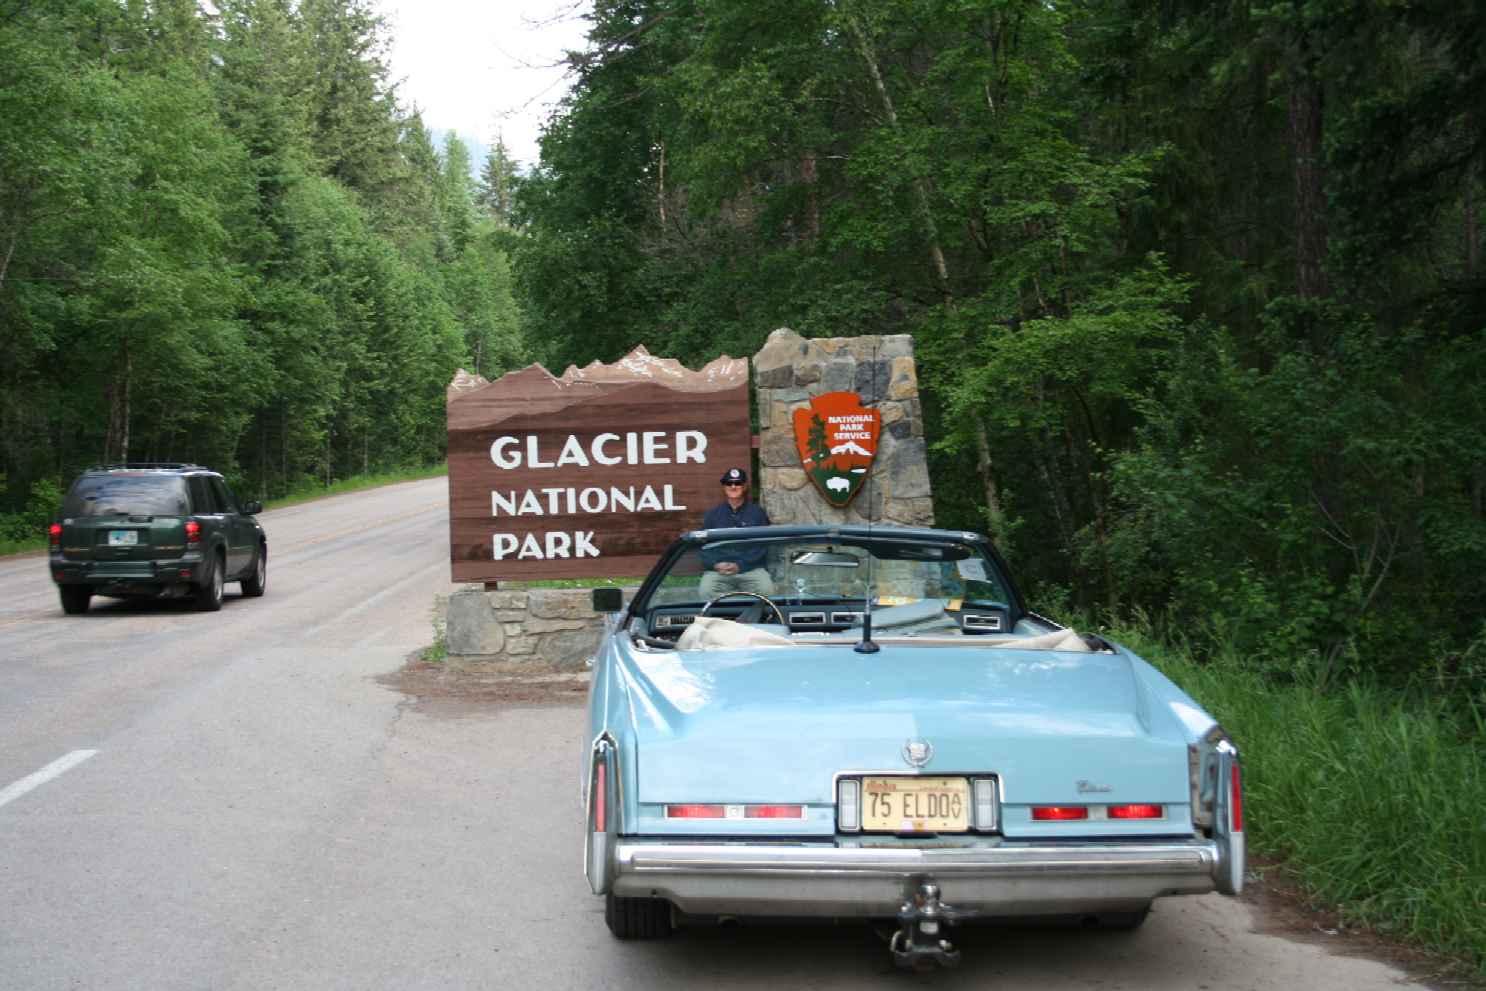 Click image for larger version  Name:Glacier_1.jpg Views:116 Size:118.2 KB ID:63286